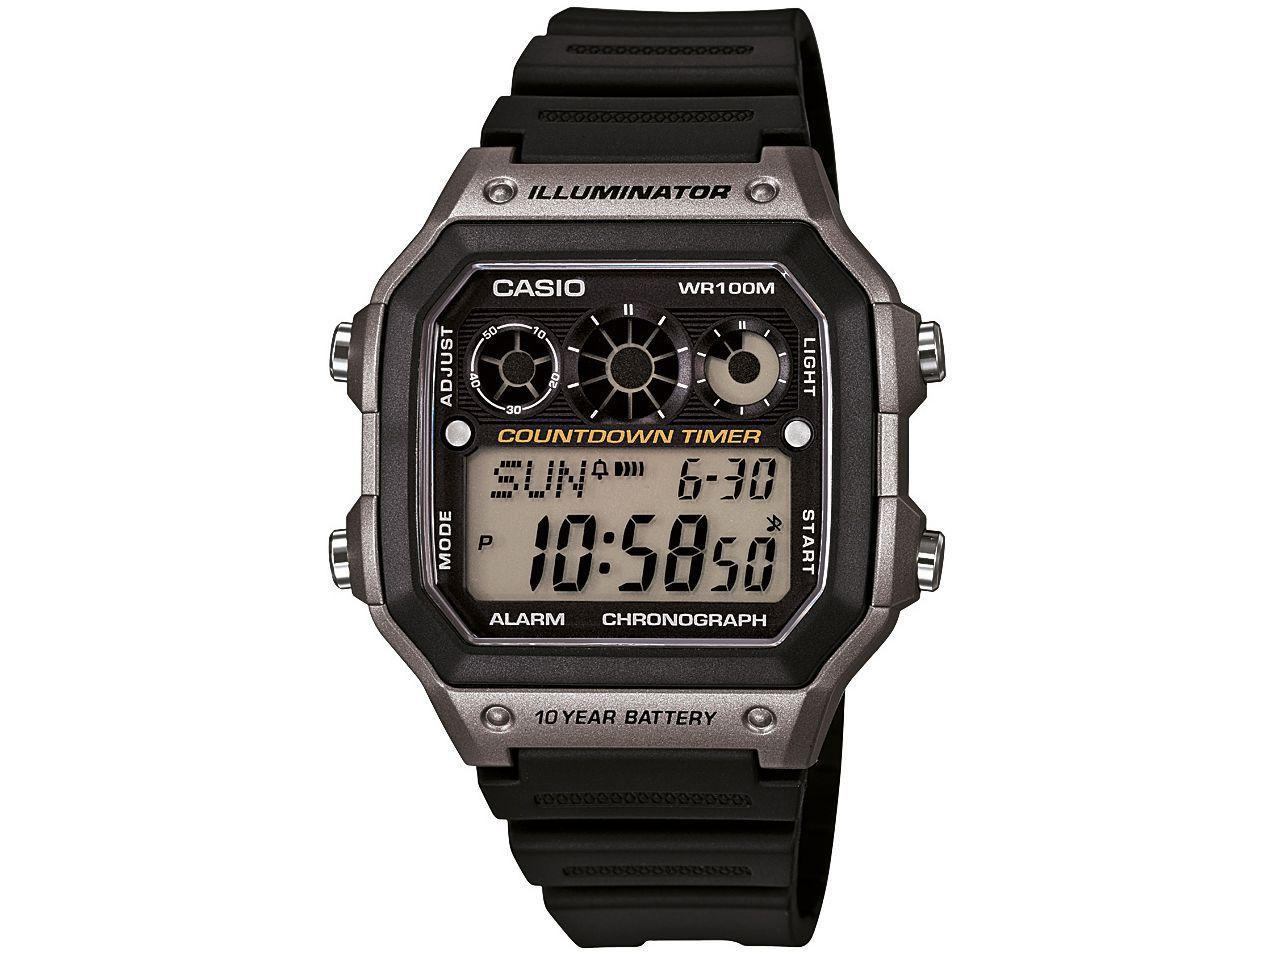 6b9c30ad4a9 Relógio Masculino Casio Digital - AE-1300WH-8AVDF - Relógio ...